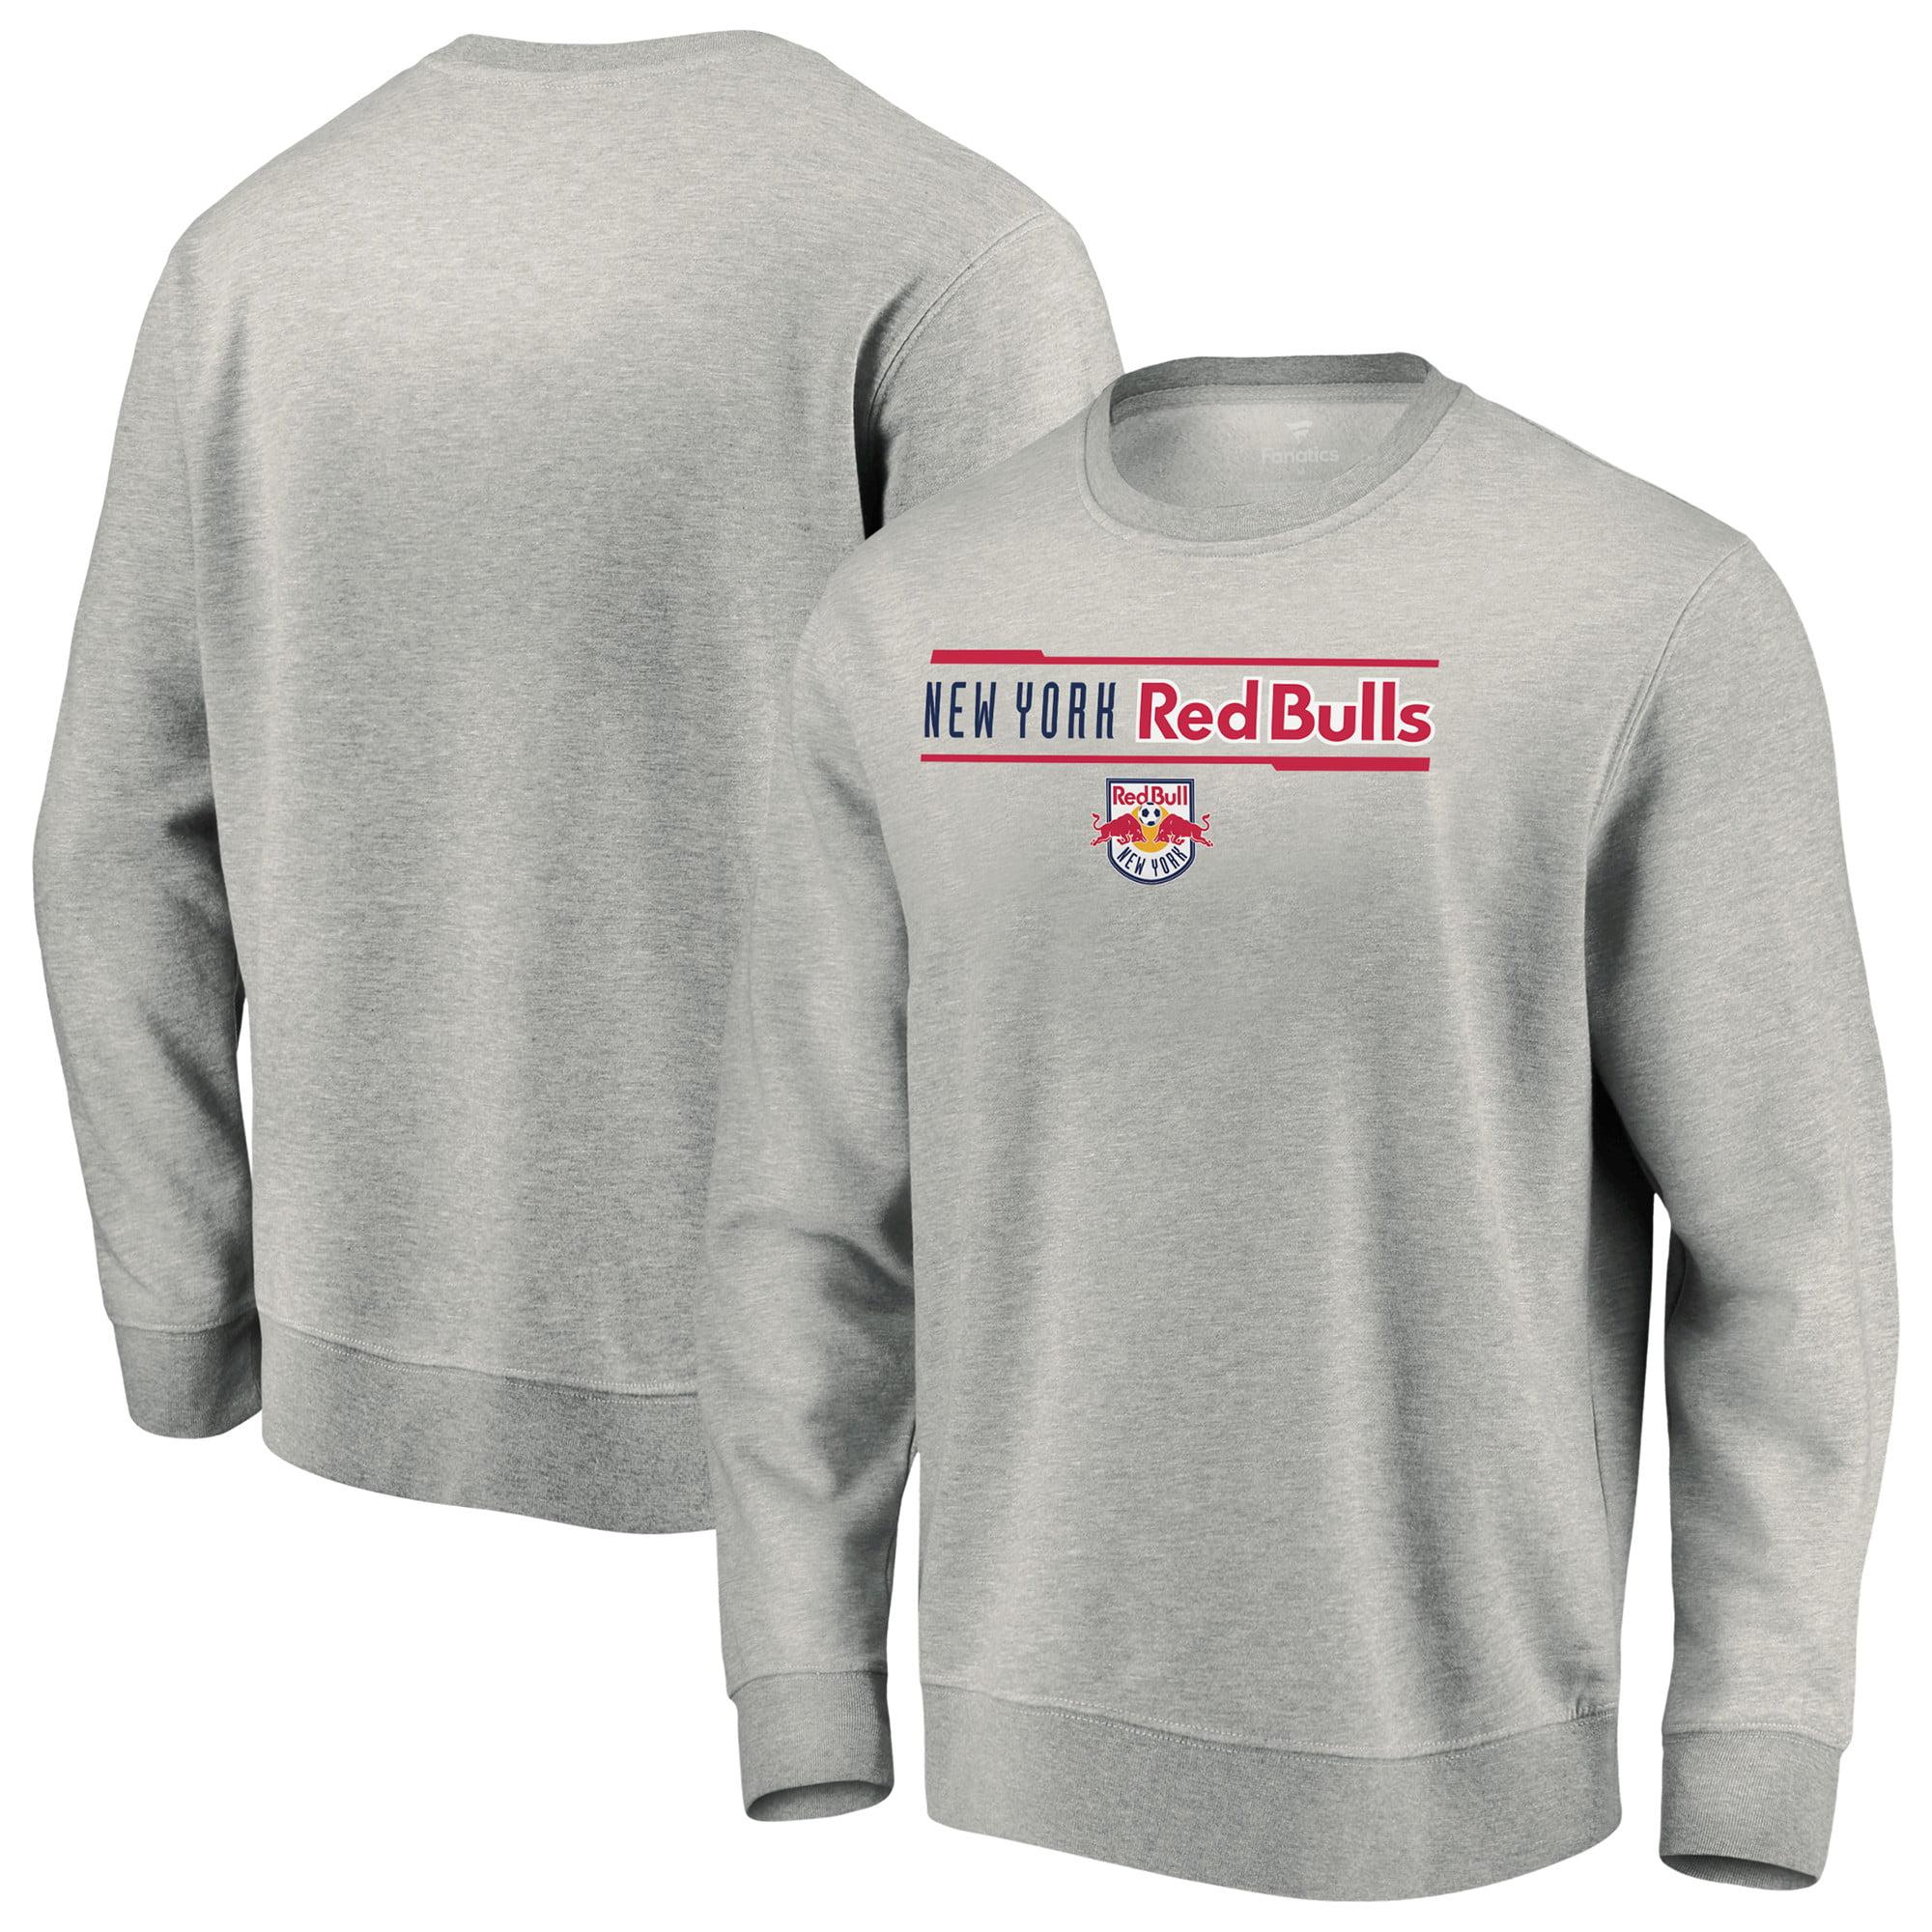 New York Red Bulls Fanatics Branded Iconic Sweatshirt - Heathered Gray